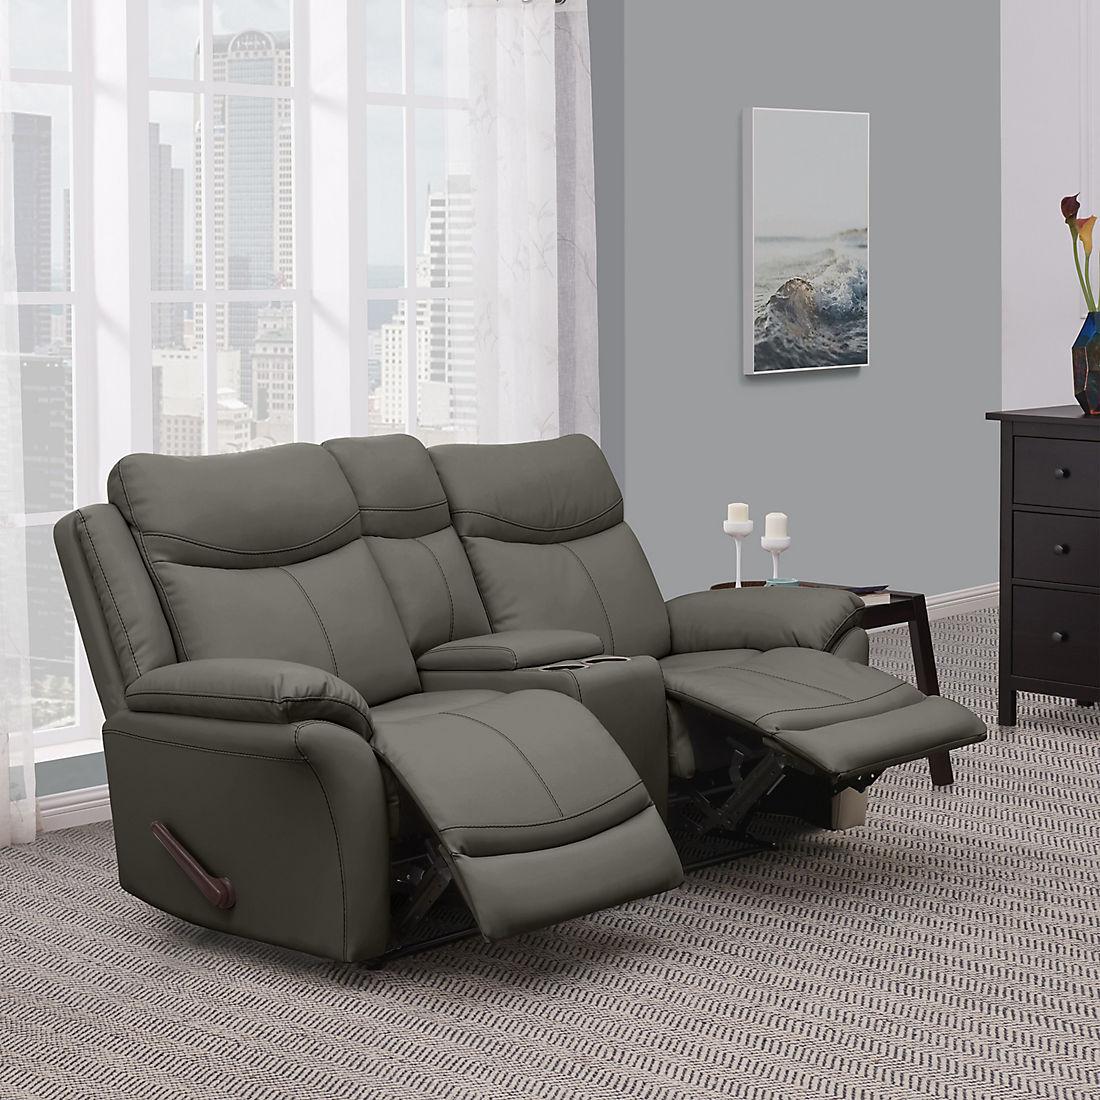 Brilliant Prolounger Wall Hugger Recliner Loveseat With Console 2 Short Links Chair Design For Home Short Linksinfo